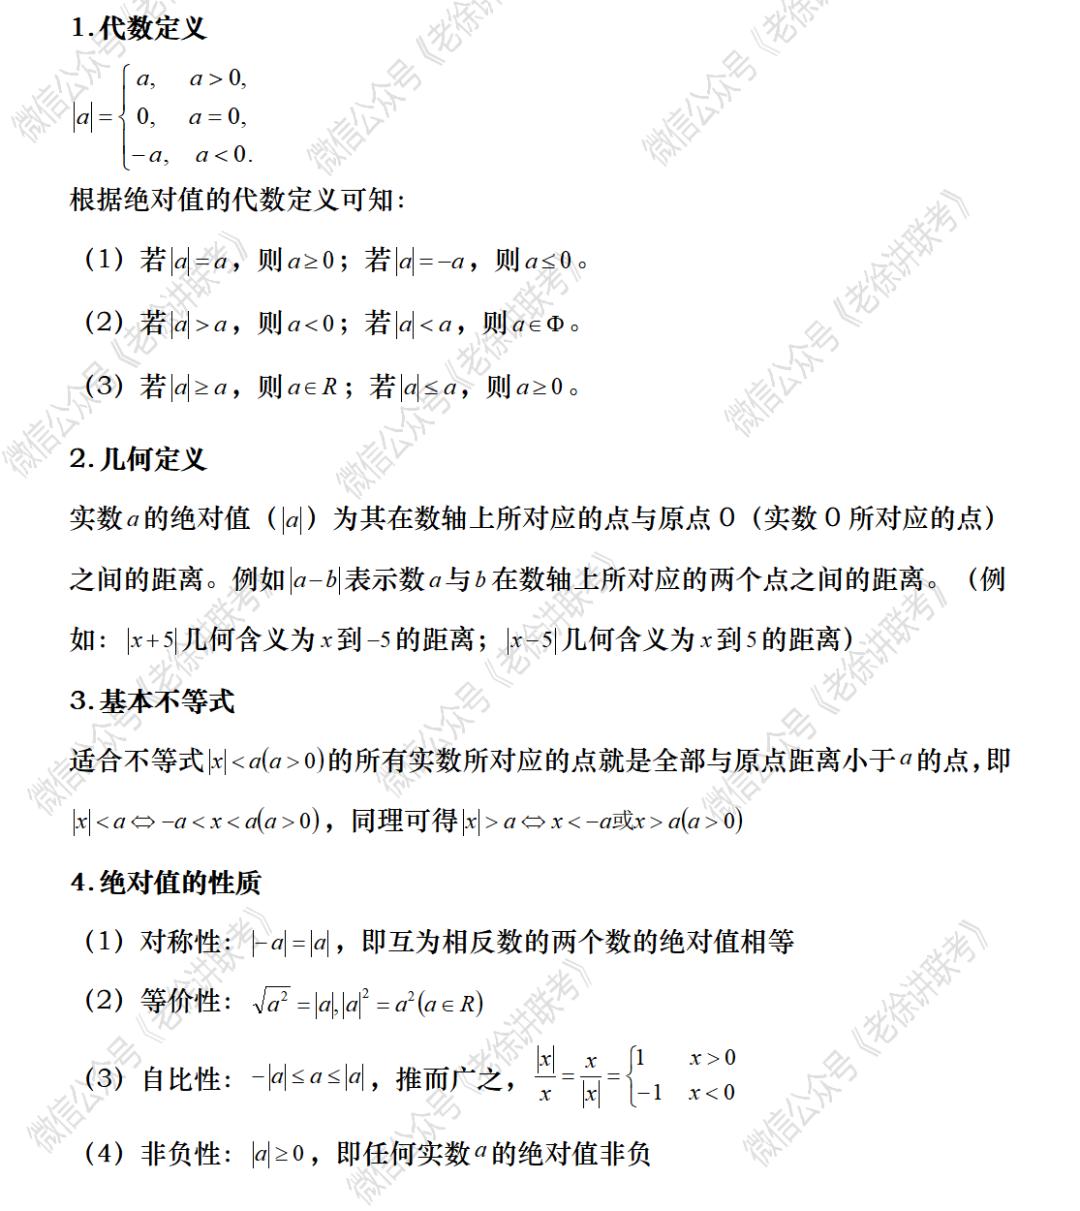 2022MBA考研|管理类联考:数学专题训练-绝对值的计算与化简(第五期)